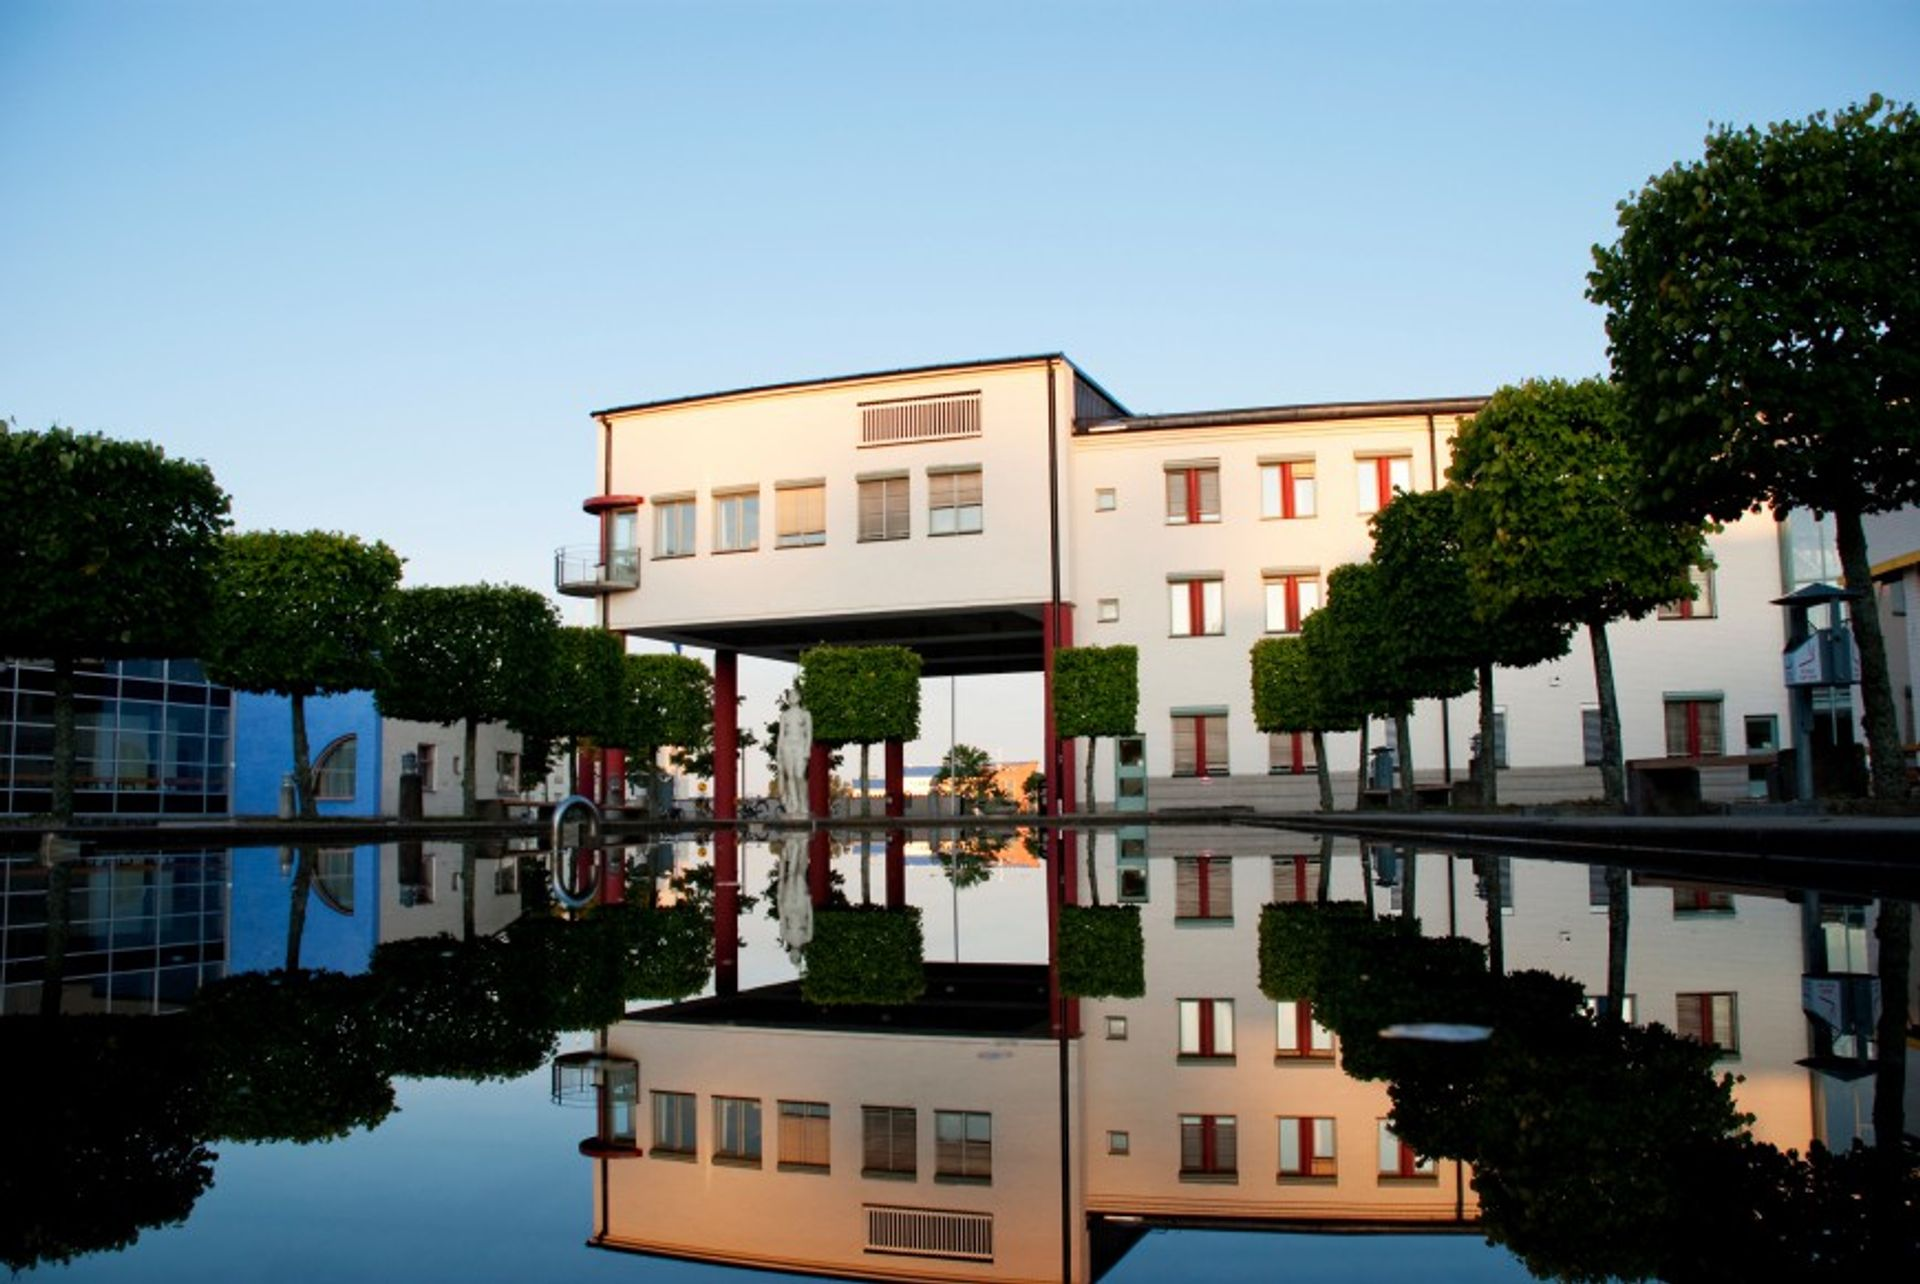 Örebro University buildings